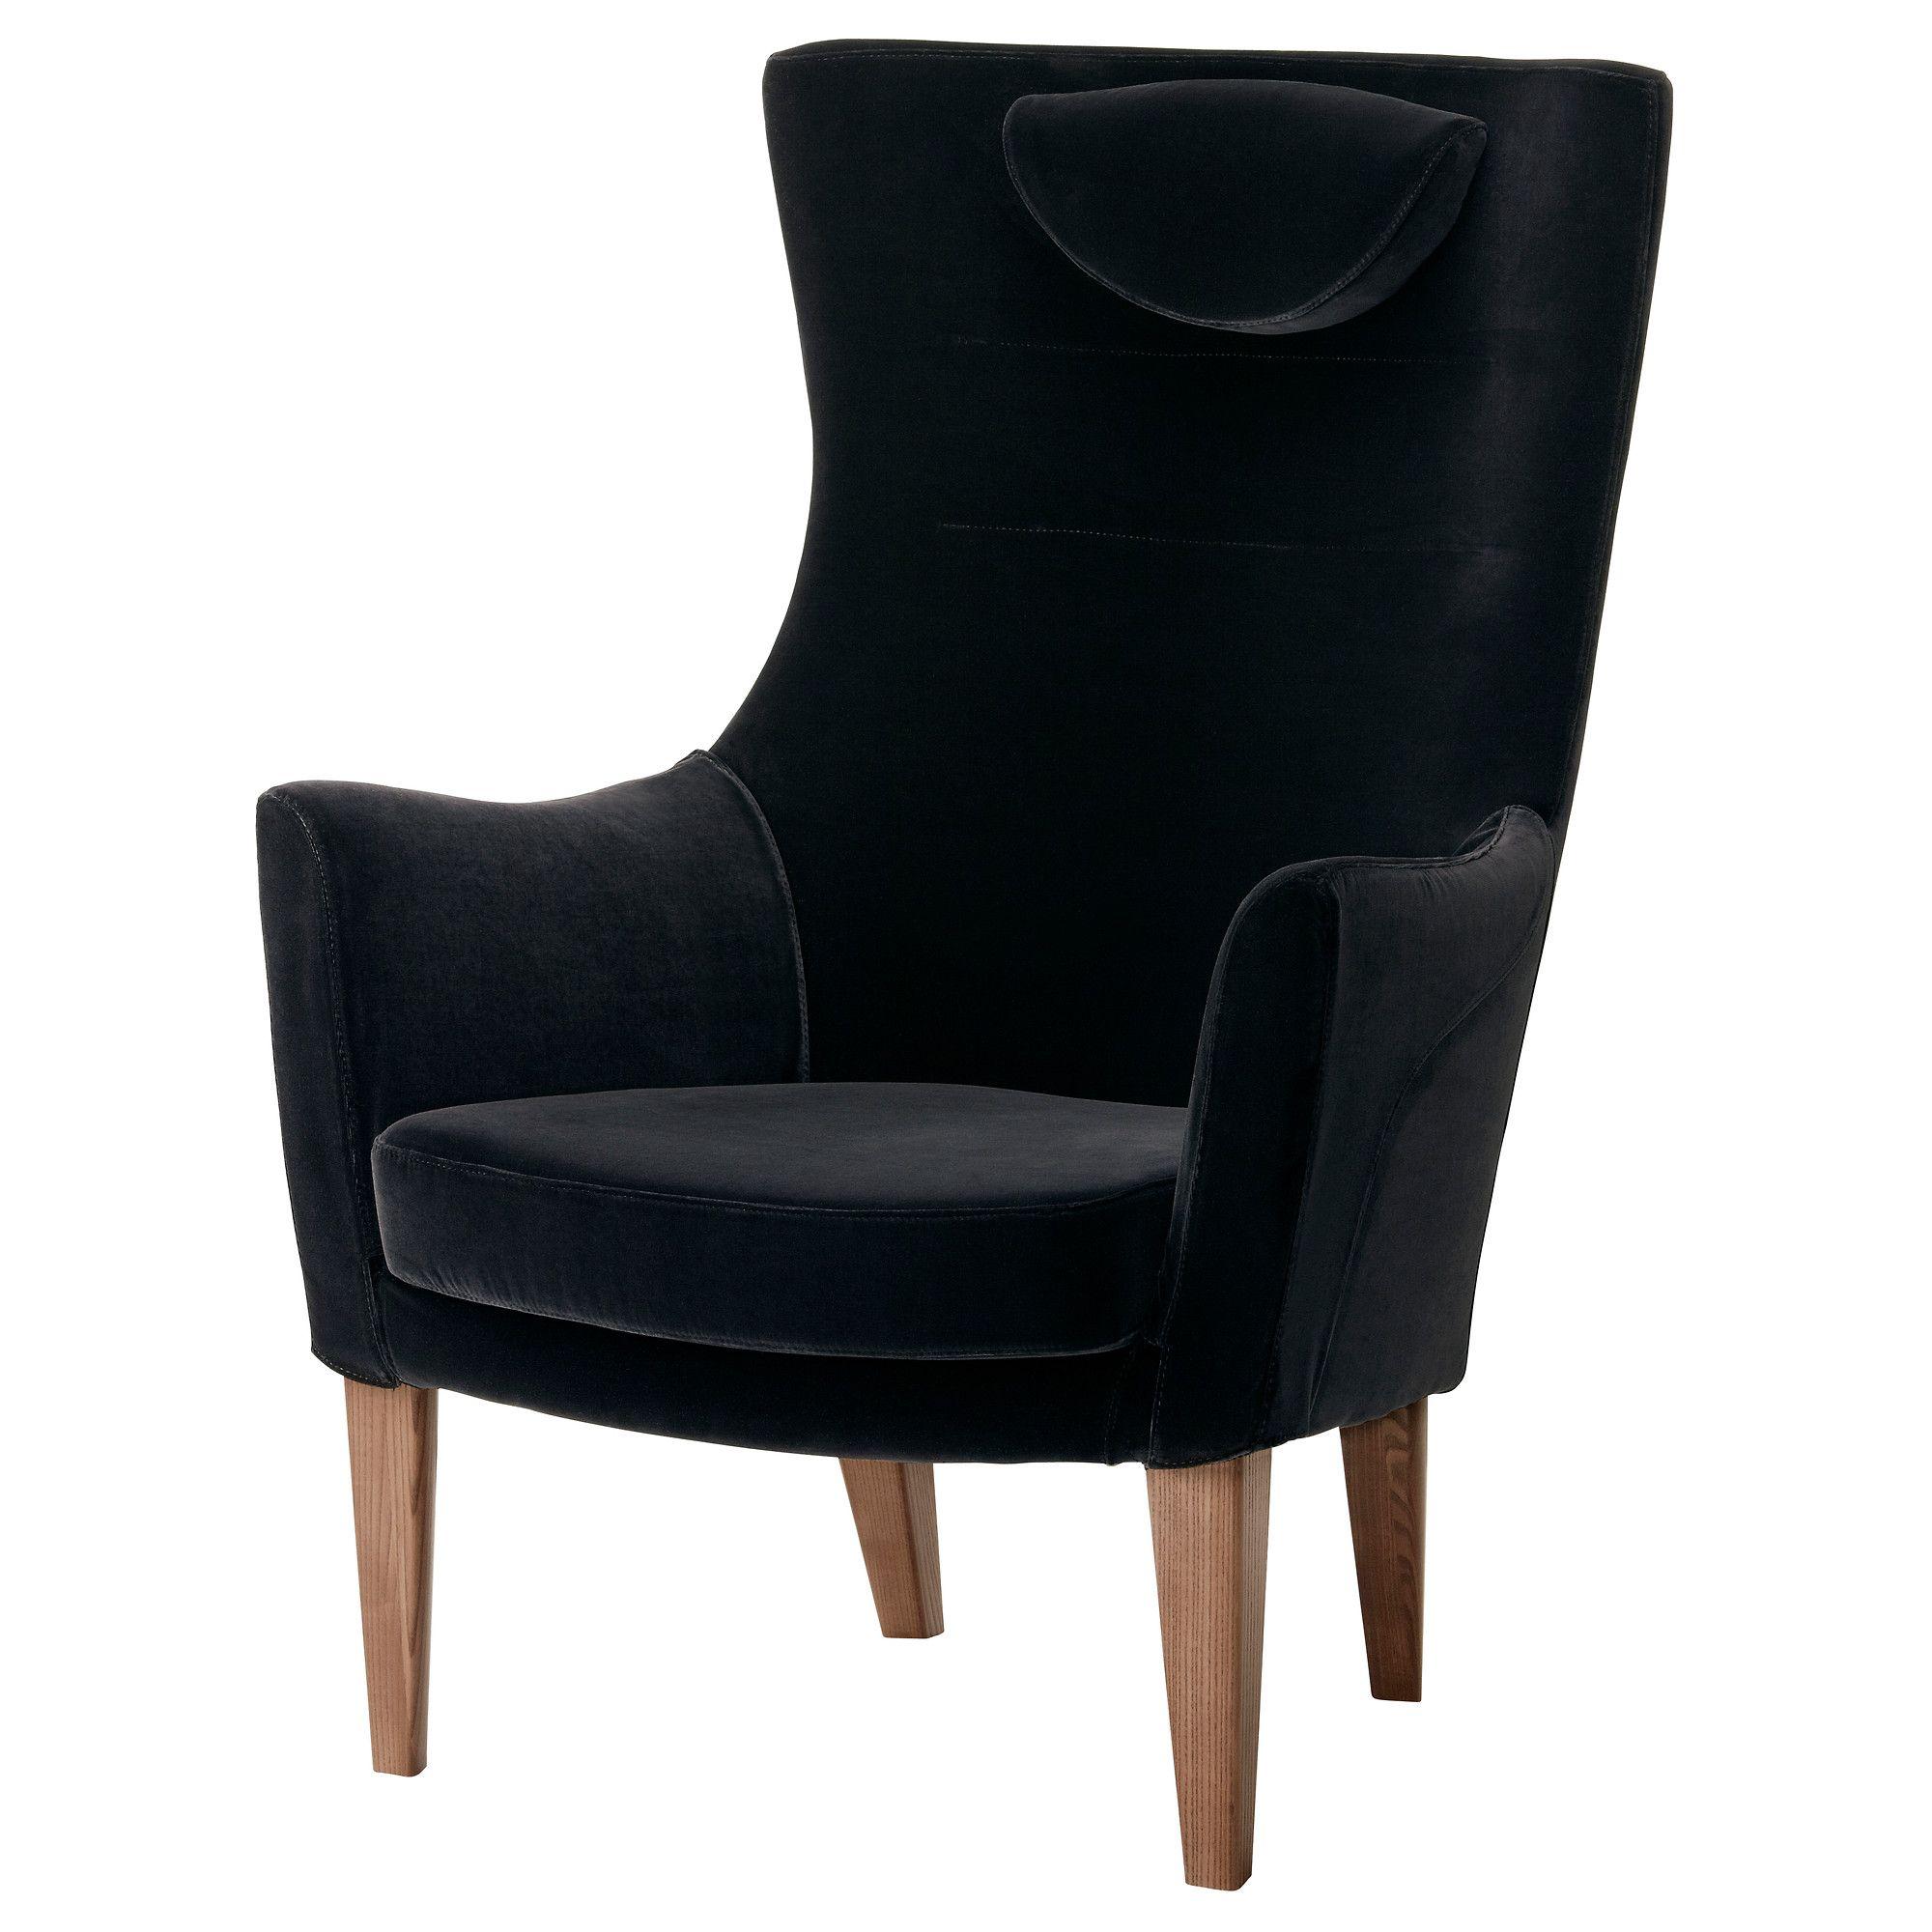 Stockholm High Back Armchair Sandbacka Black Ikea 599 Chairs